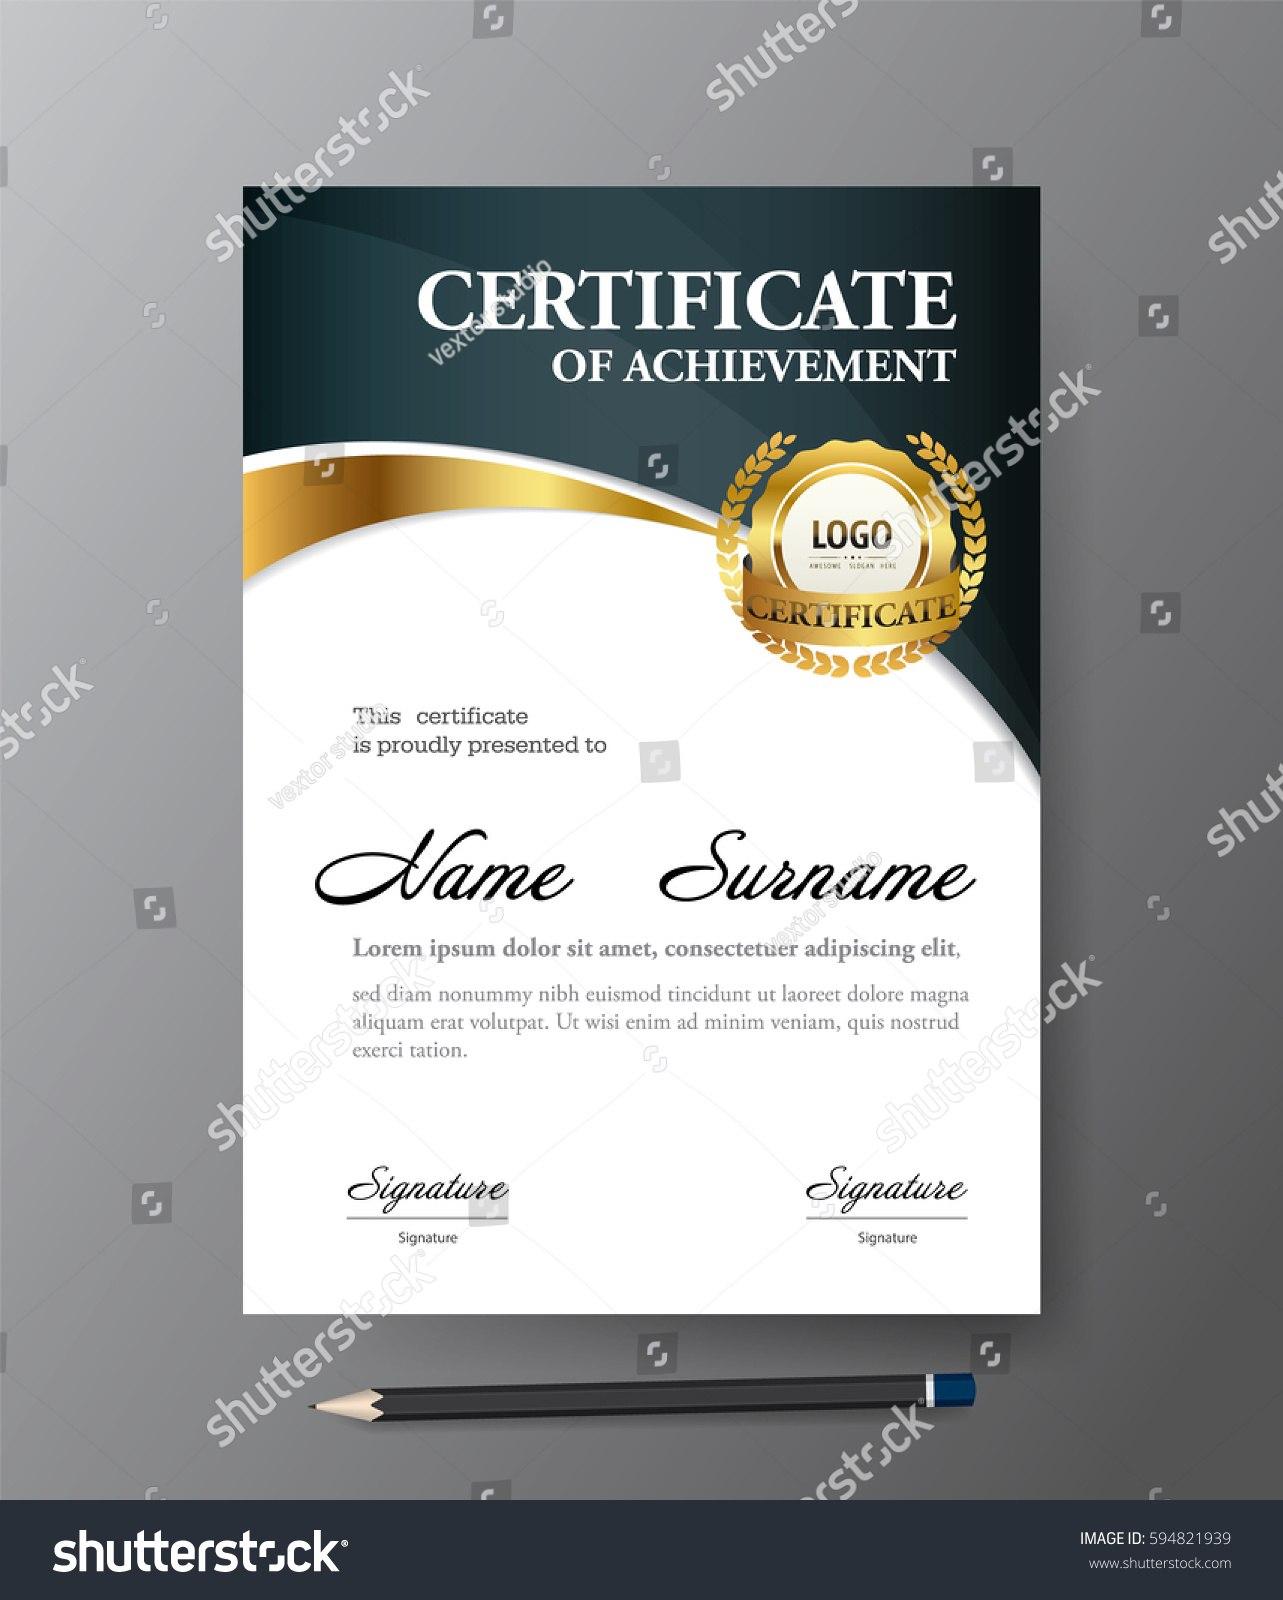 Certificate Templatea Size Diploma Vector Illustration Stock Vector Within Certificate Template Size